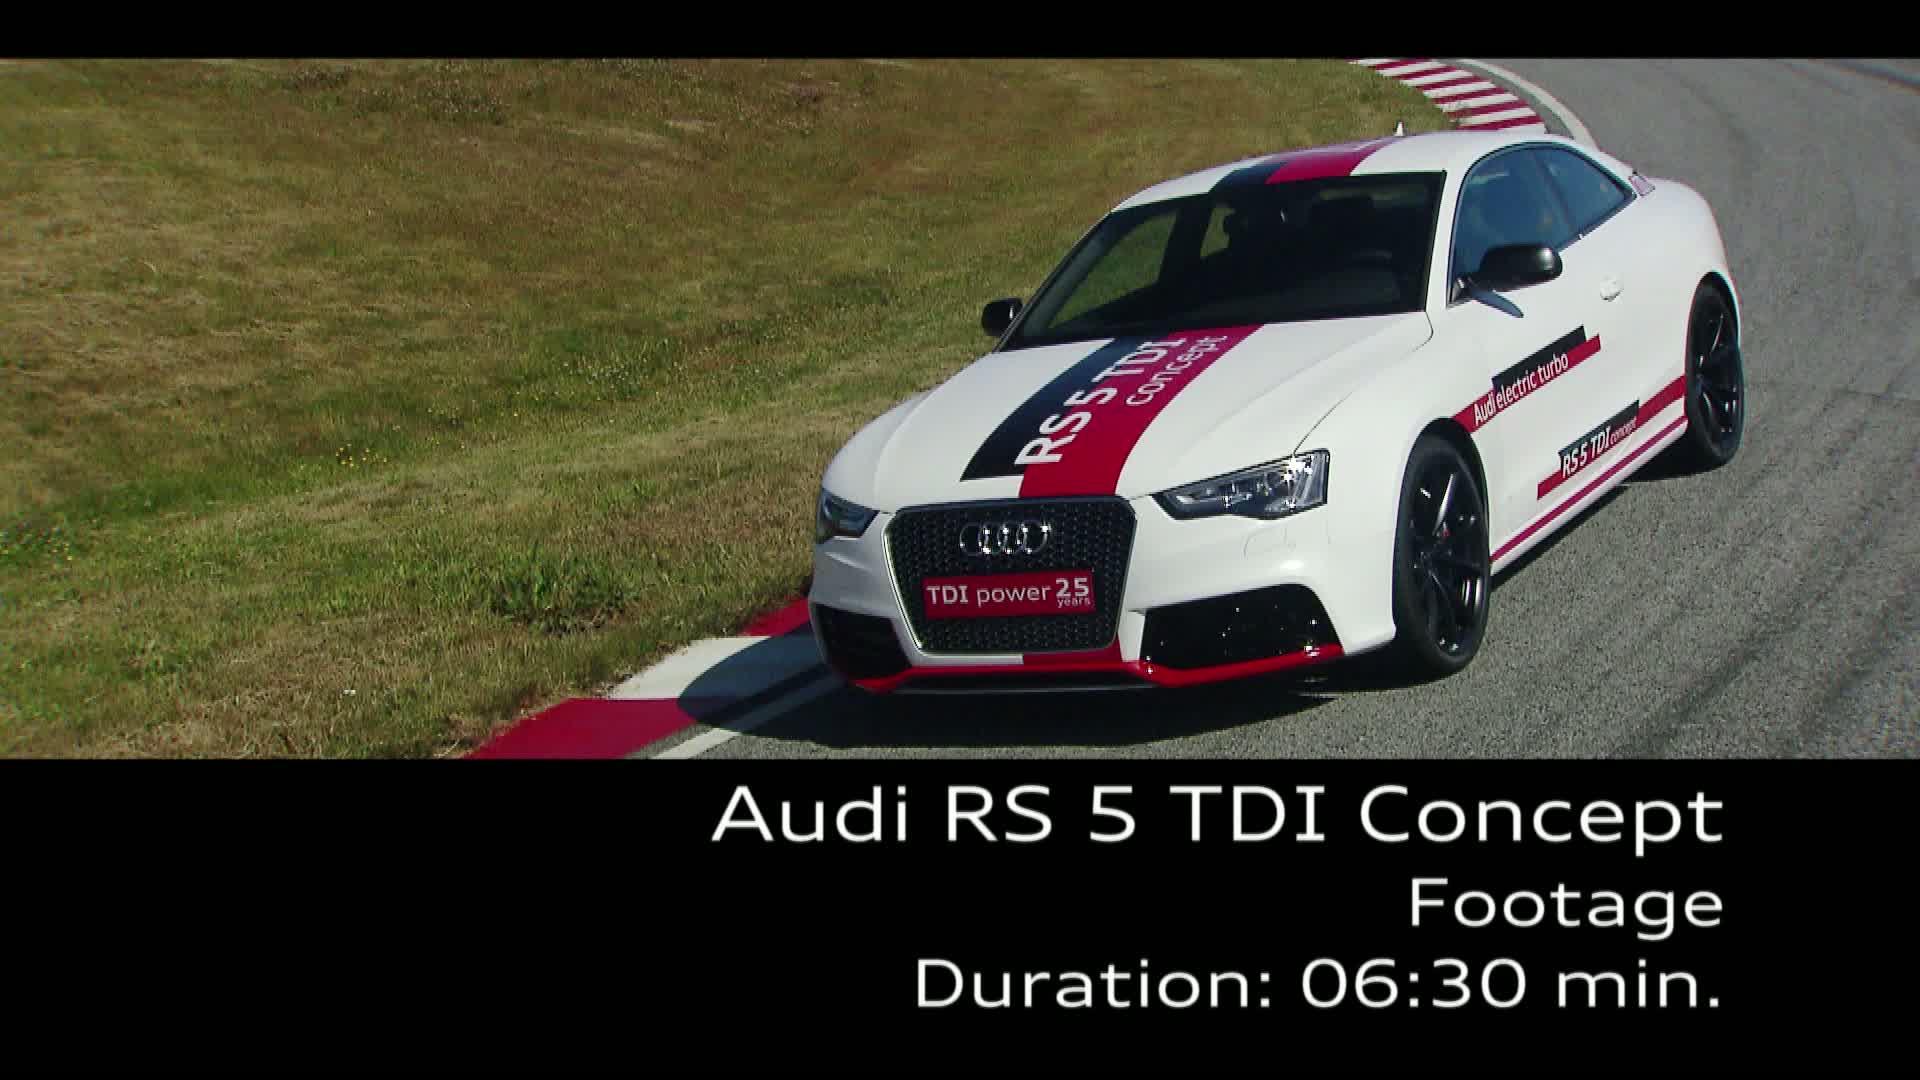 Der Audi RS 5 TDI Concept - Footage